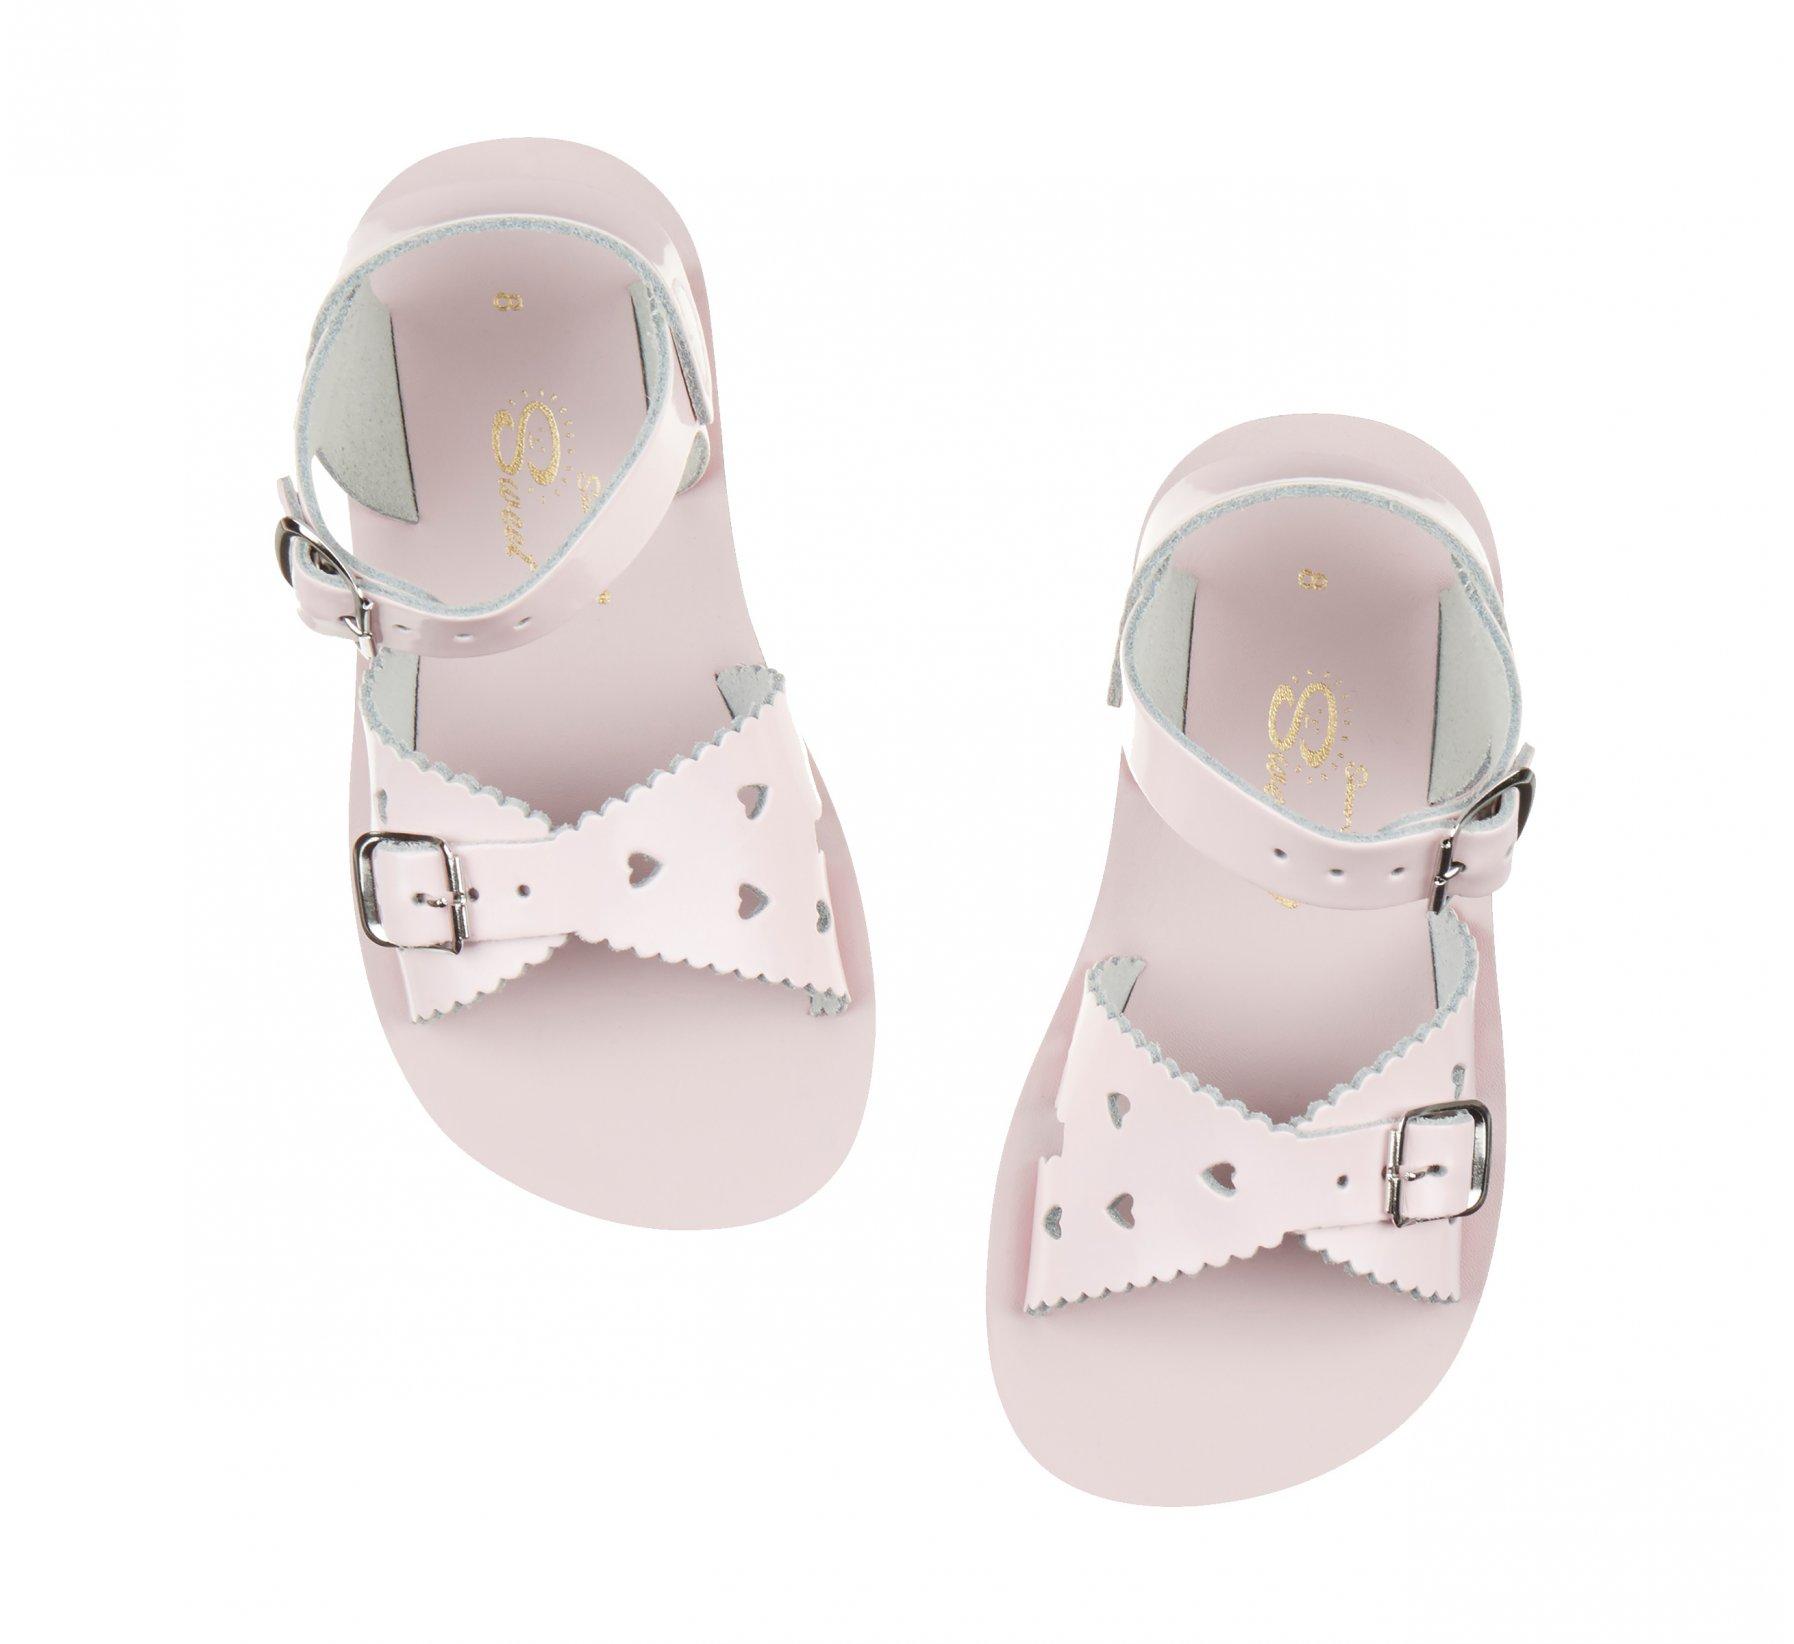 Sweetheart Merah Jambu Berkilat - Salt Water Sandals